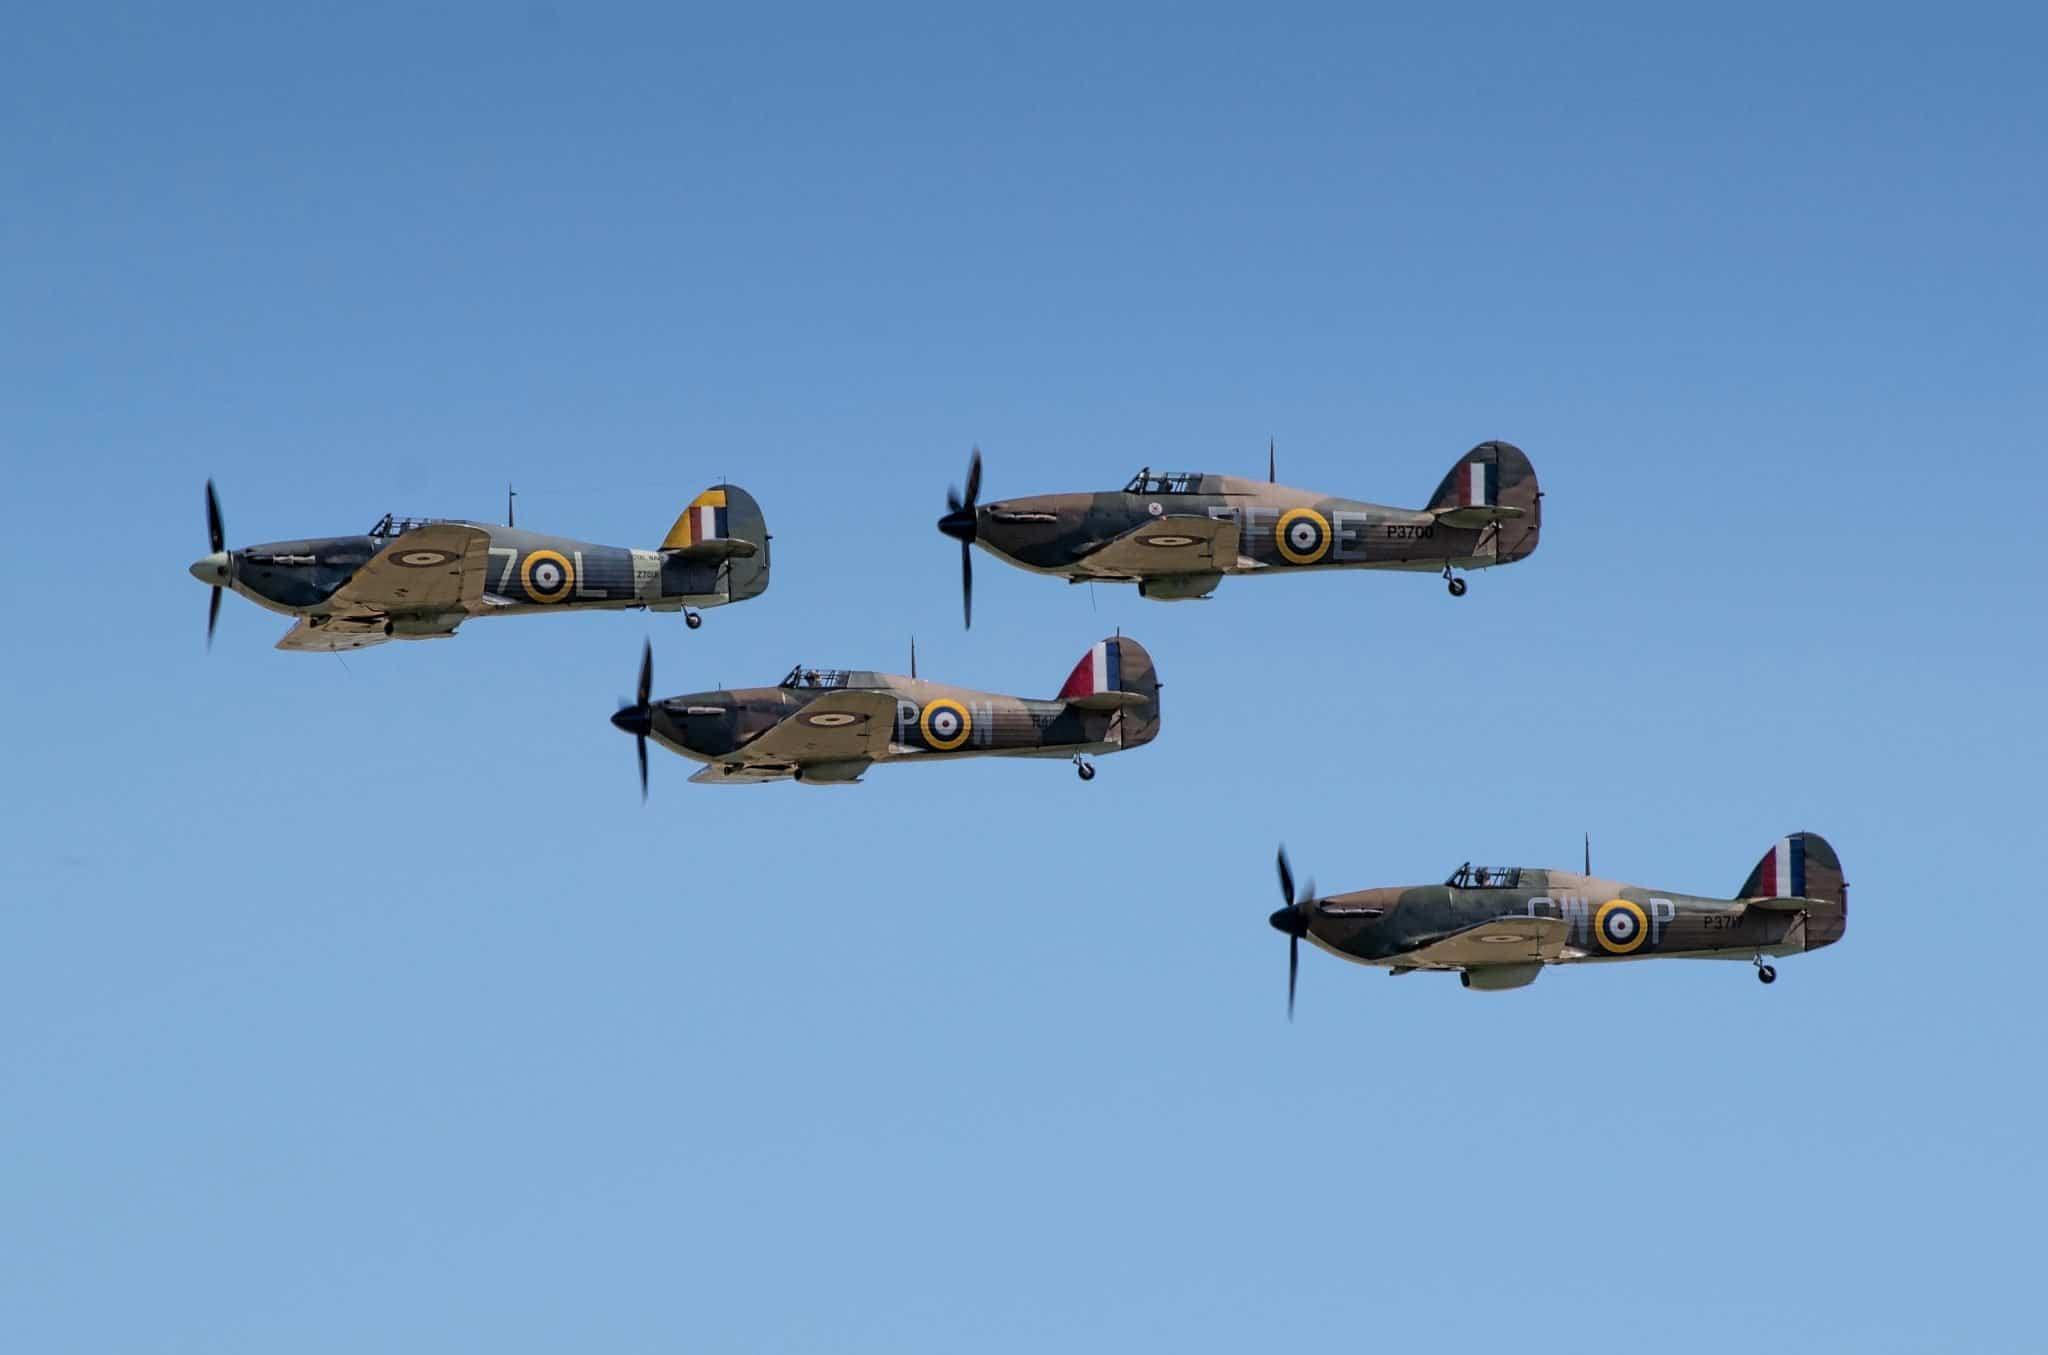 Spitfire planes